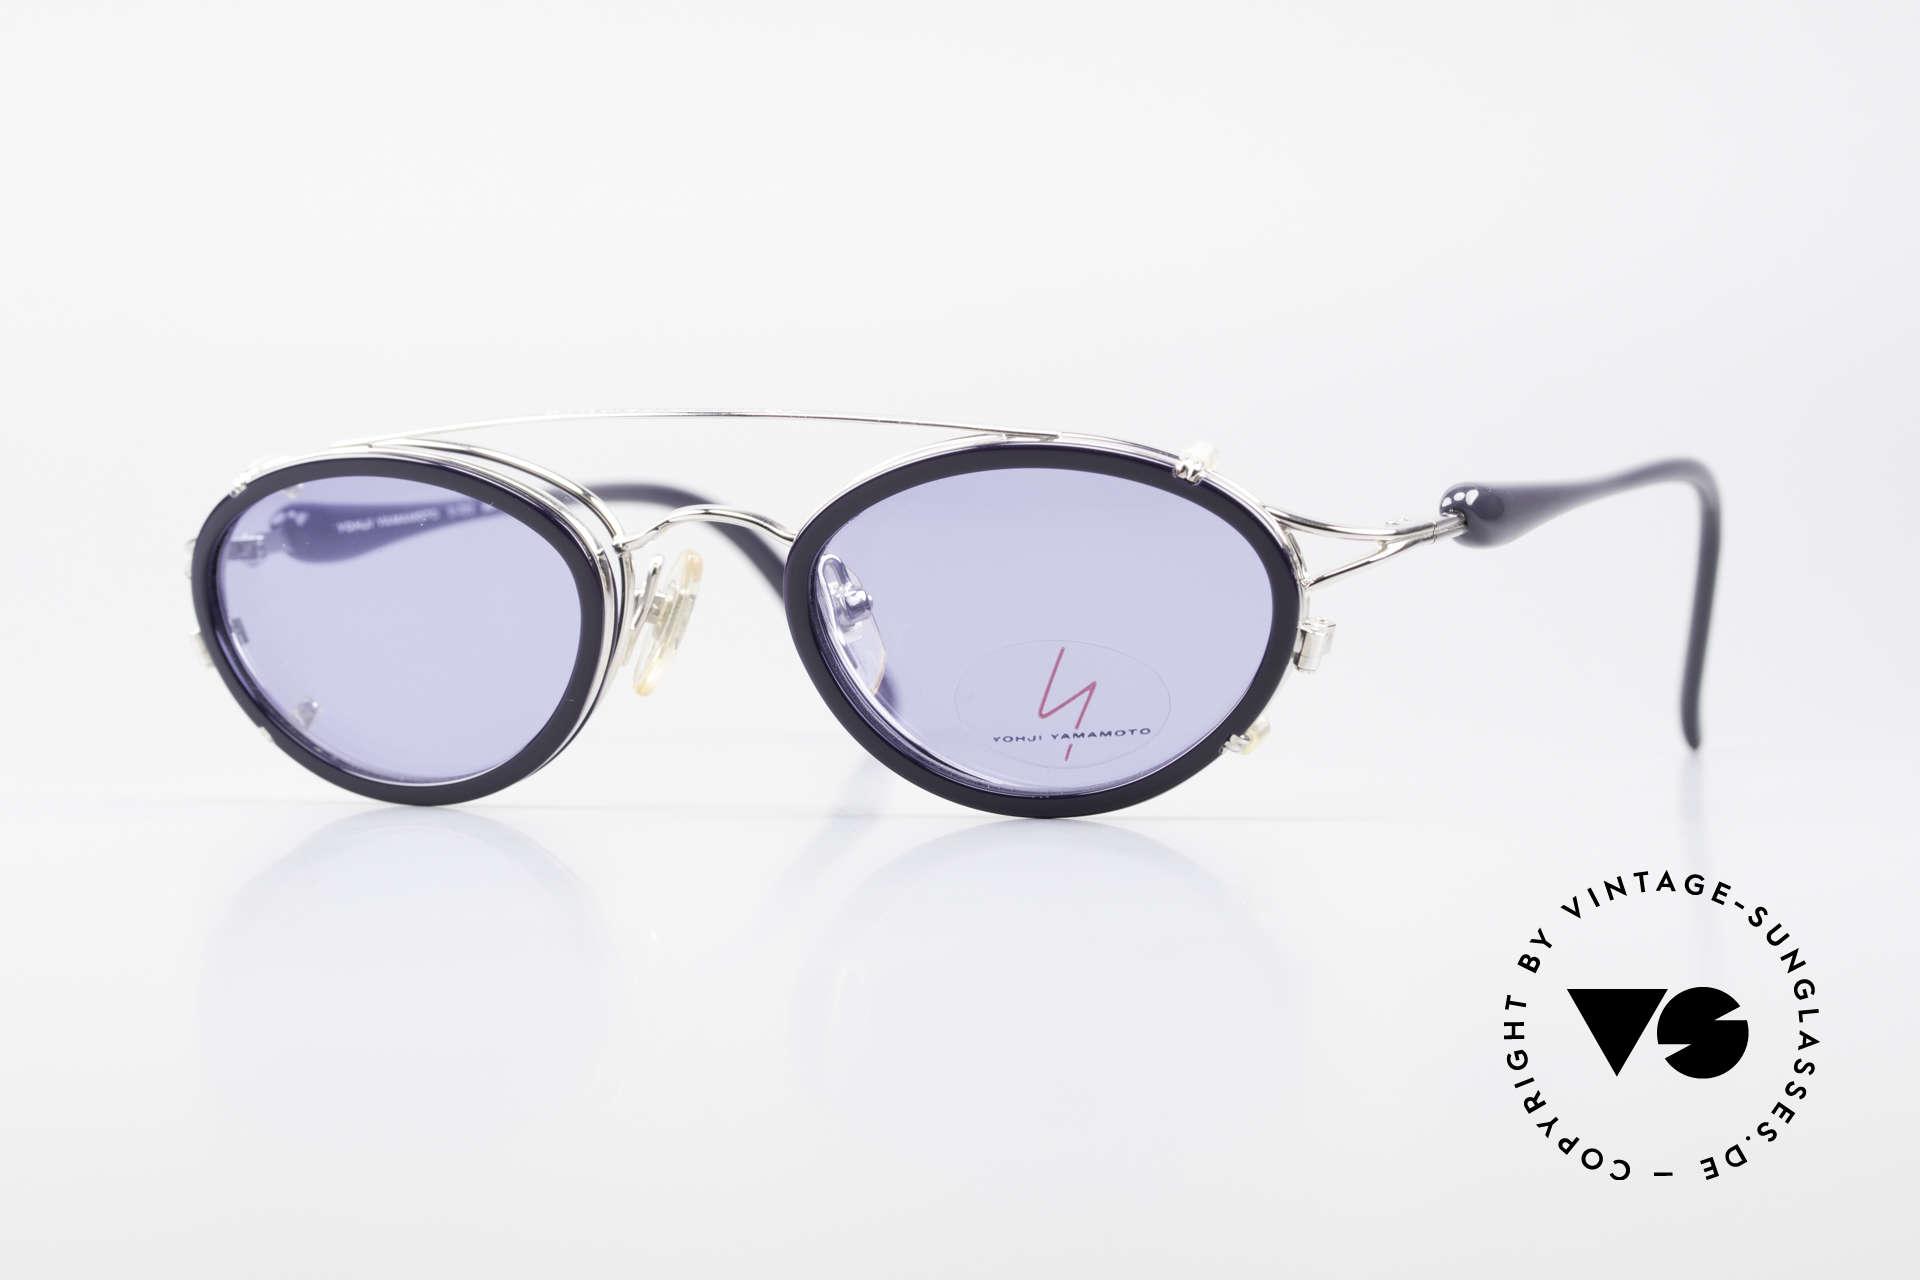 Yohji Yamamoto 51-7210 Clip-On 90's No Retro Shades, vintage 1990's sunglasses by Yohji Yamamoto, Japan, Made for Men and Women